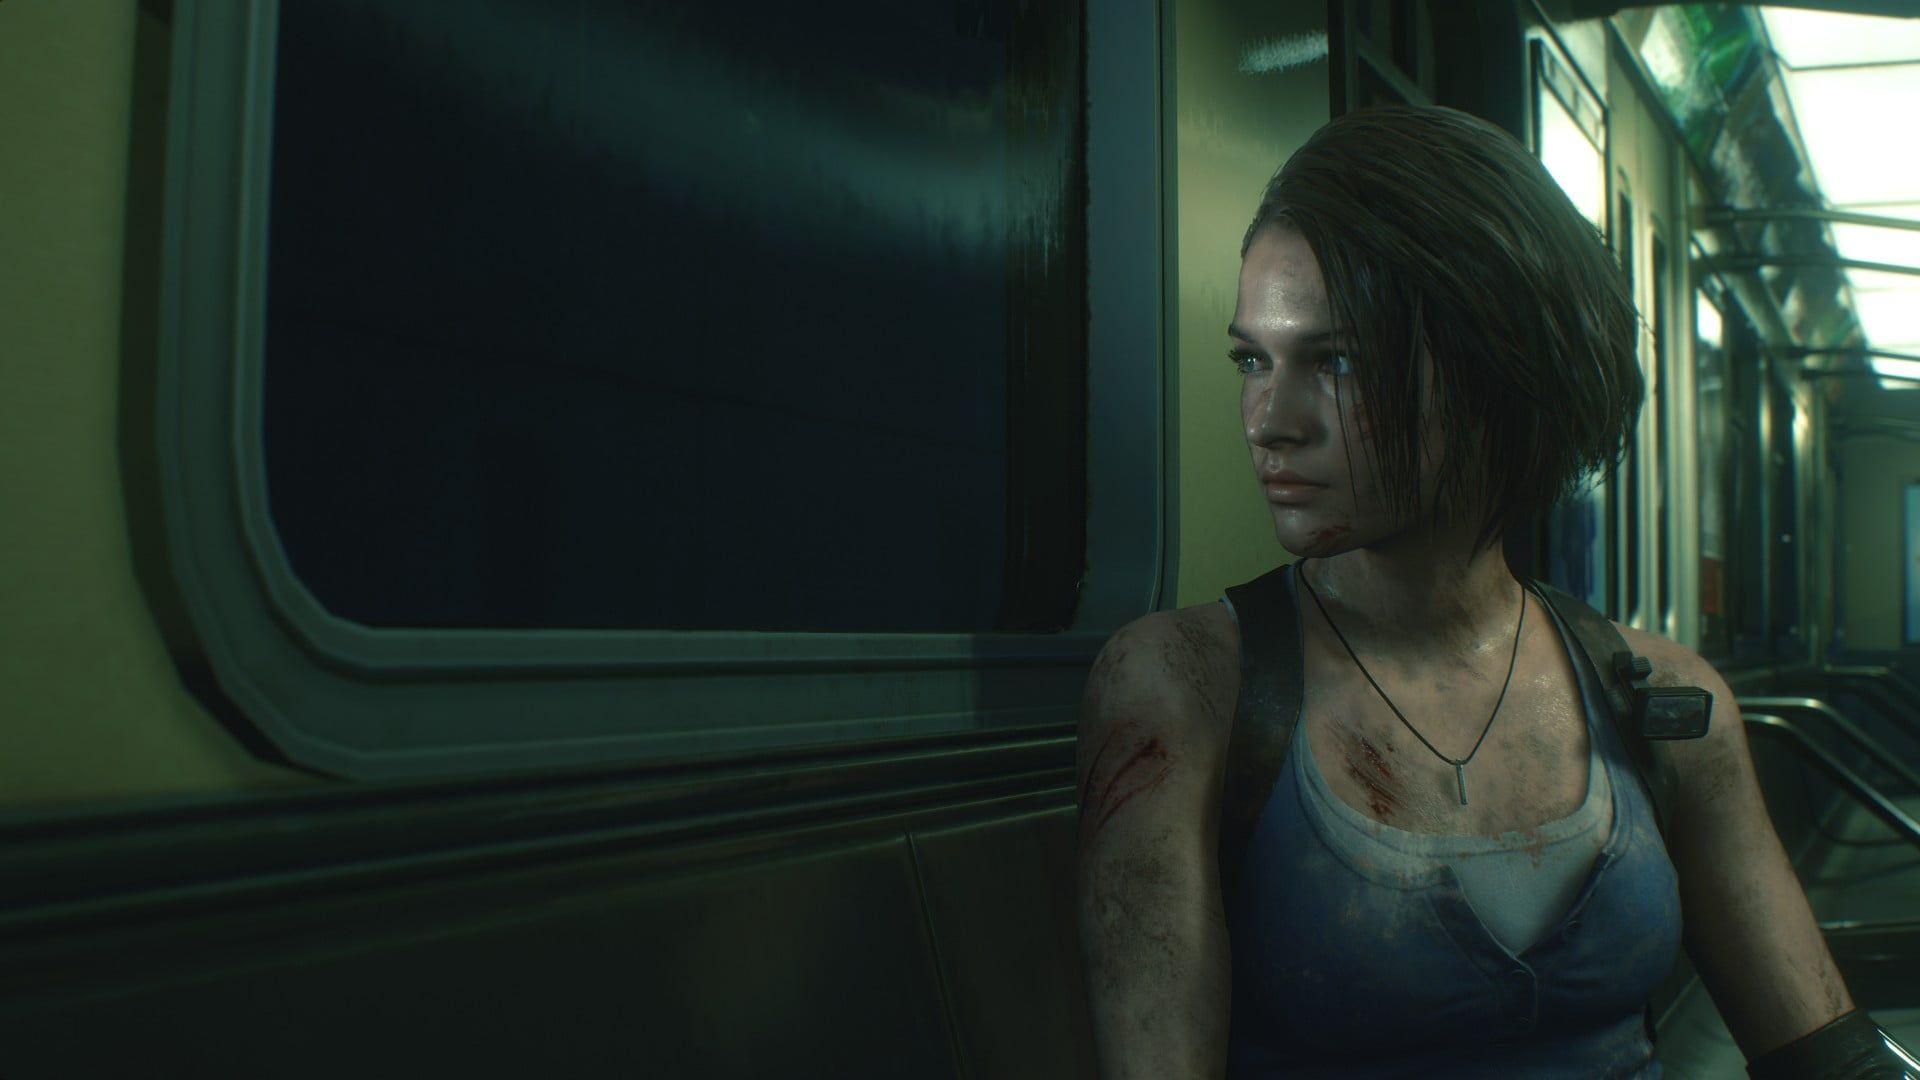 Jill Valentine Resident Evil 3 1080p Wallpaper Hdwallpaper